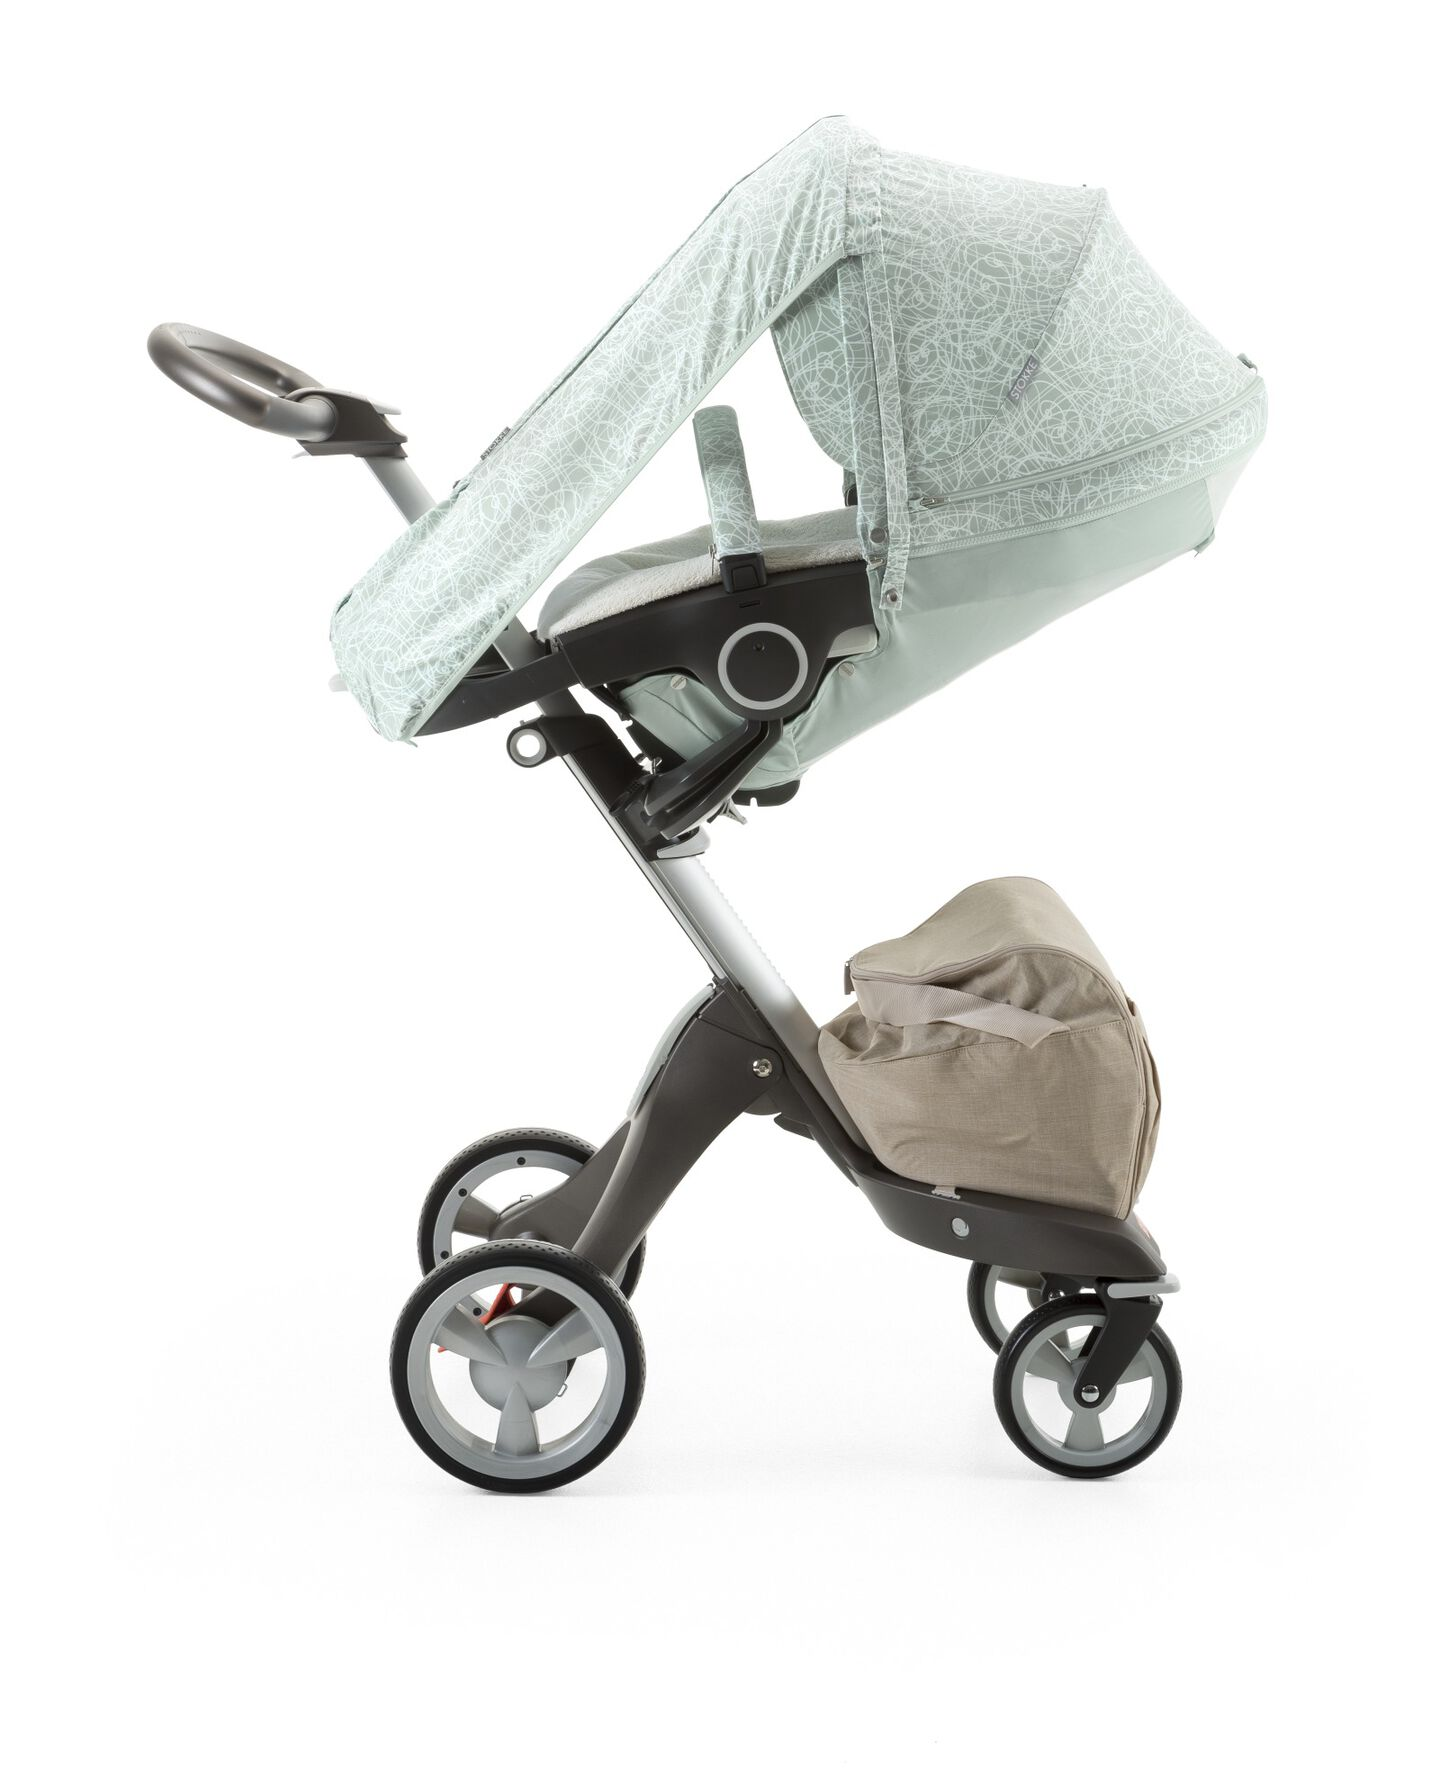 Stokke® Xplory® with Stokke® Stroller Summer Kit Scribble Salty Blue.